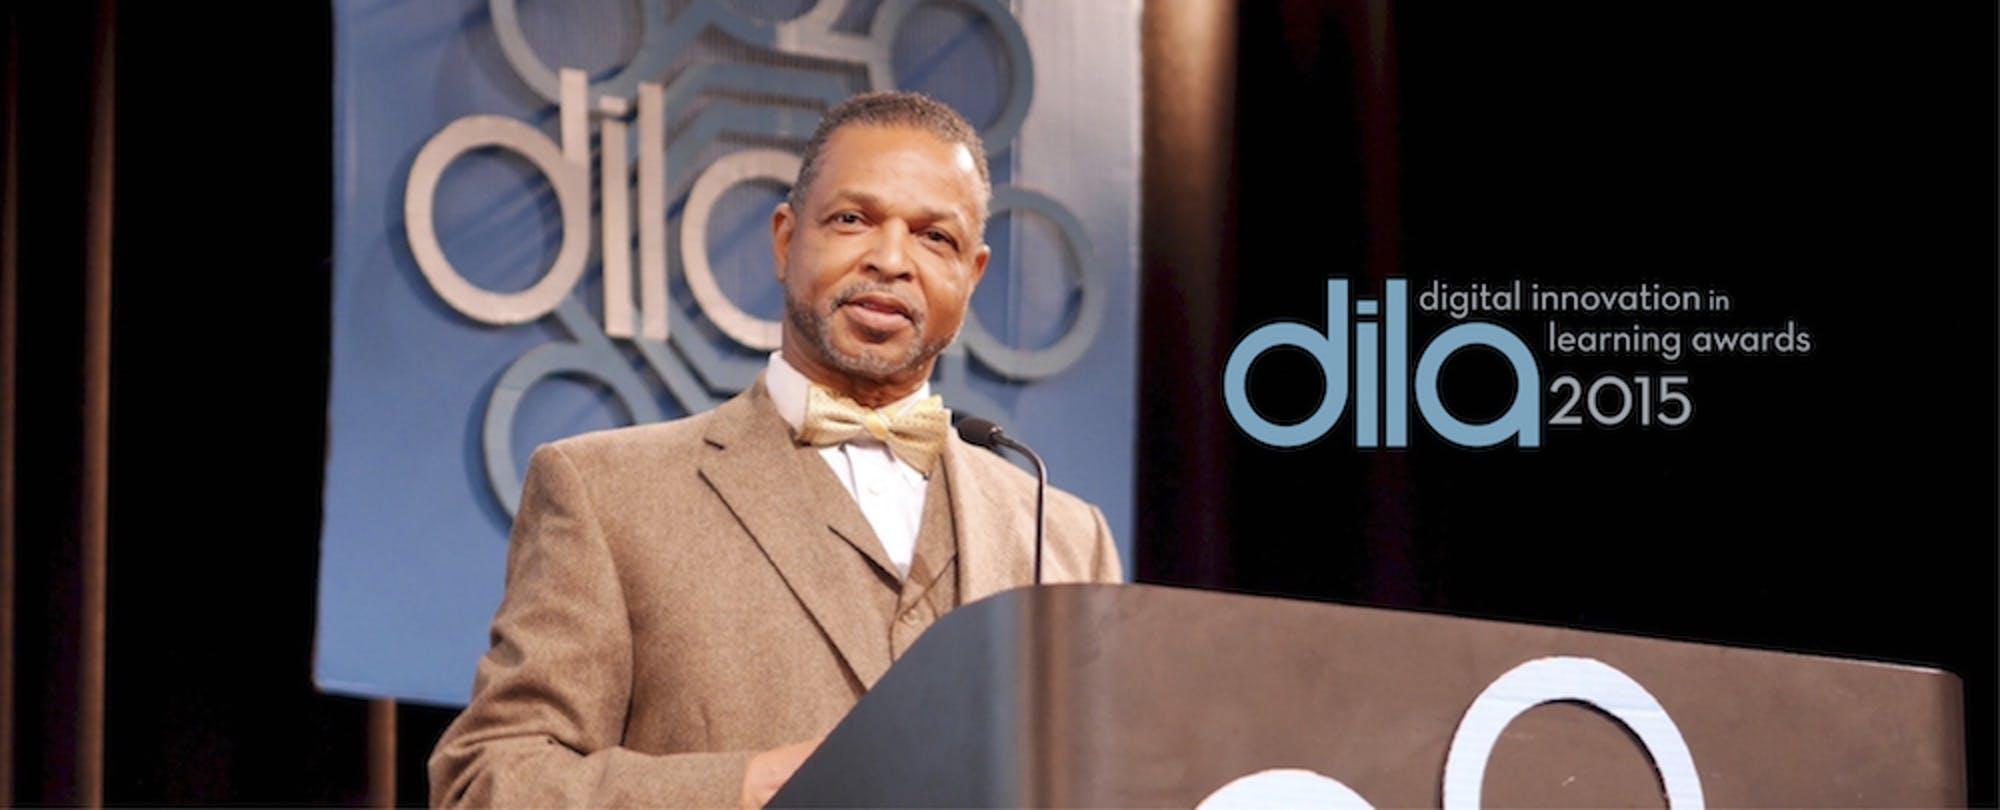 'I Saw It as a Mission': A Q&A With DILA Winner Dr. Dyke Redmond